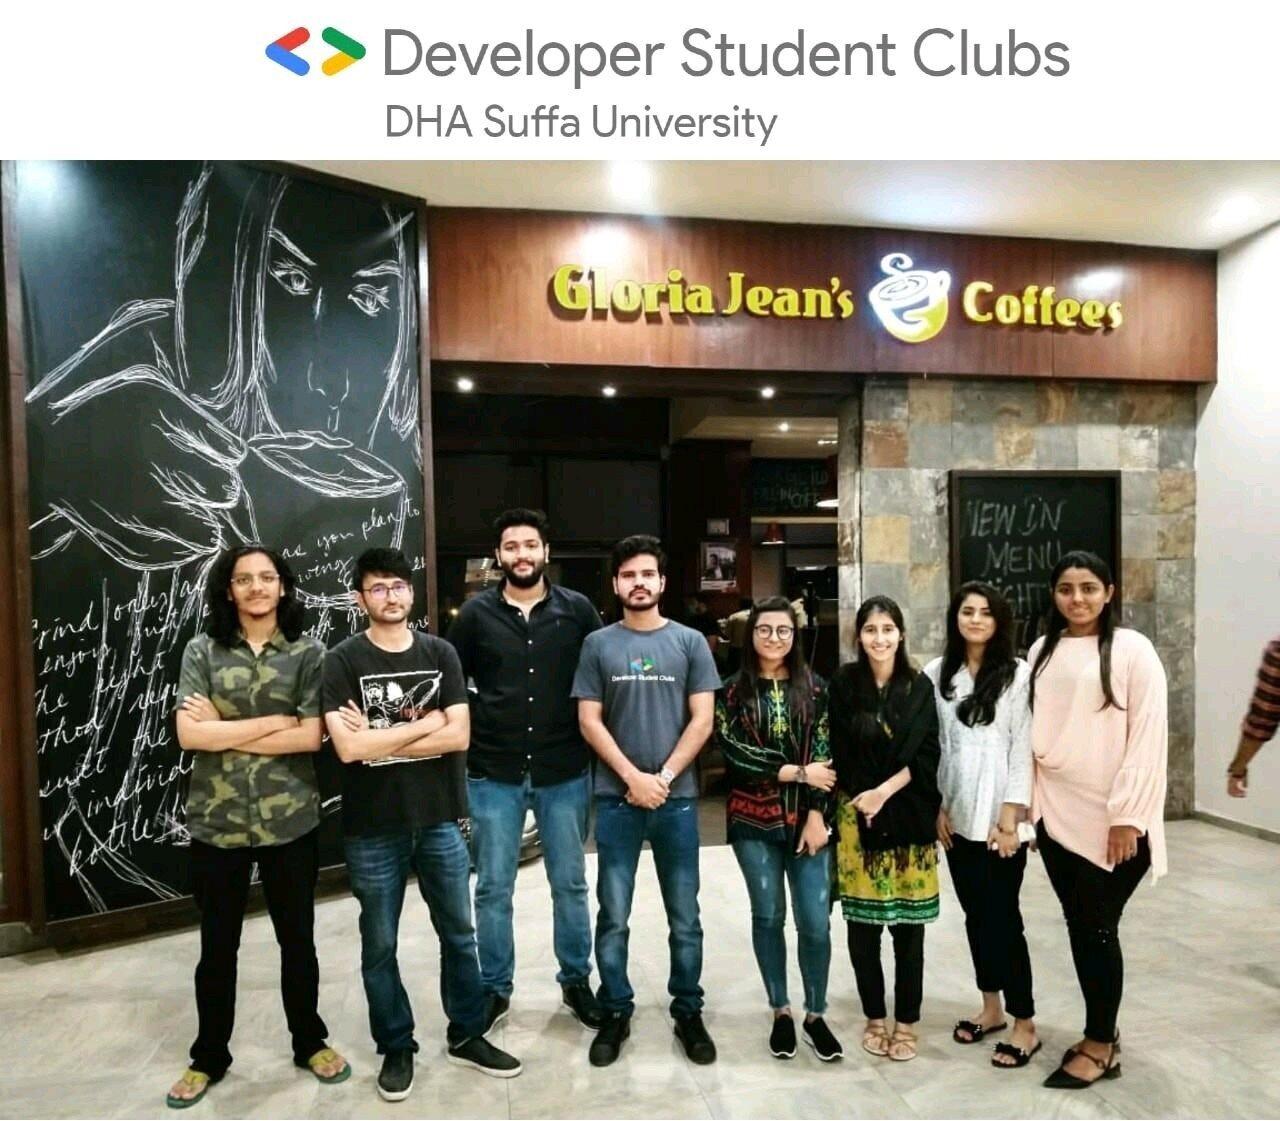 GDSC@DSU Core Team (left-to-right): Tarun Kumar, Shaham Mahmood, Abeer Shaikh,    Syed Ateeq (GDSC Lead)   , Sarah Nasir, Amina Kazim, Nimra Nasir, Muskan Halani. Not pictured: Alishan, Bahawal, Abdul Rauf Bughio, and Shifali.